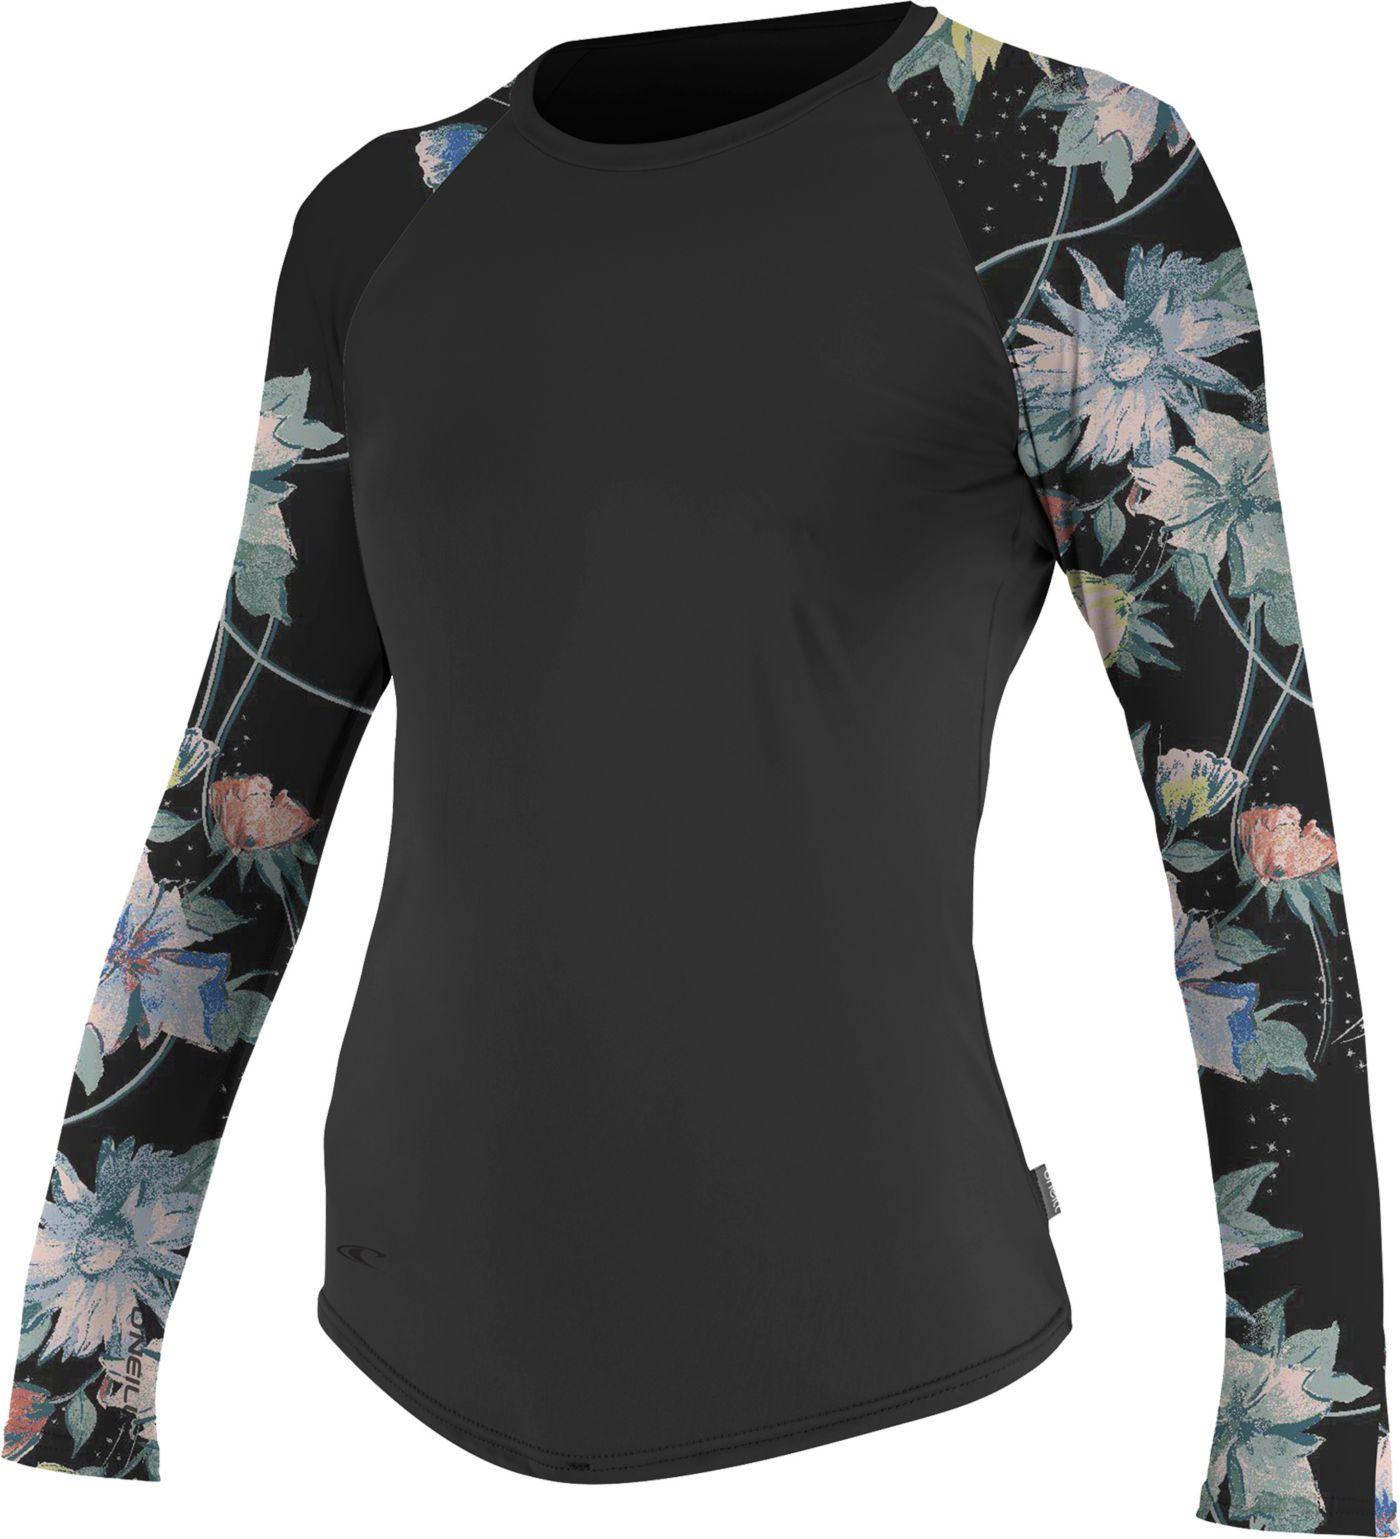 O'Neill Women's Sleeve Print Long Sleeve Rash Guard